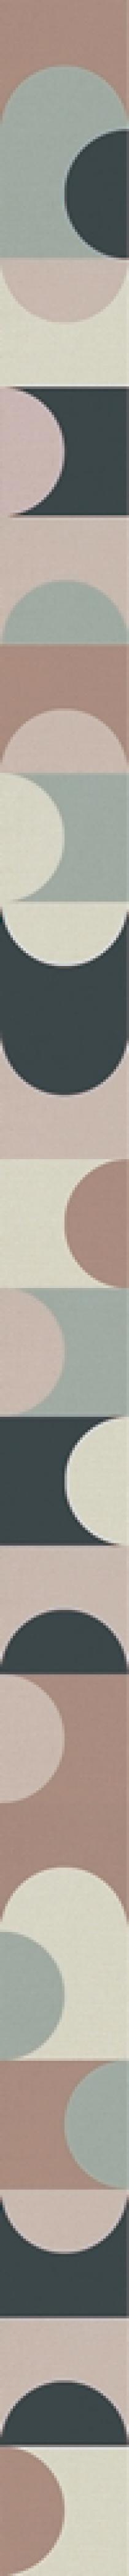 MURAL (100x70 cm) 15X15